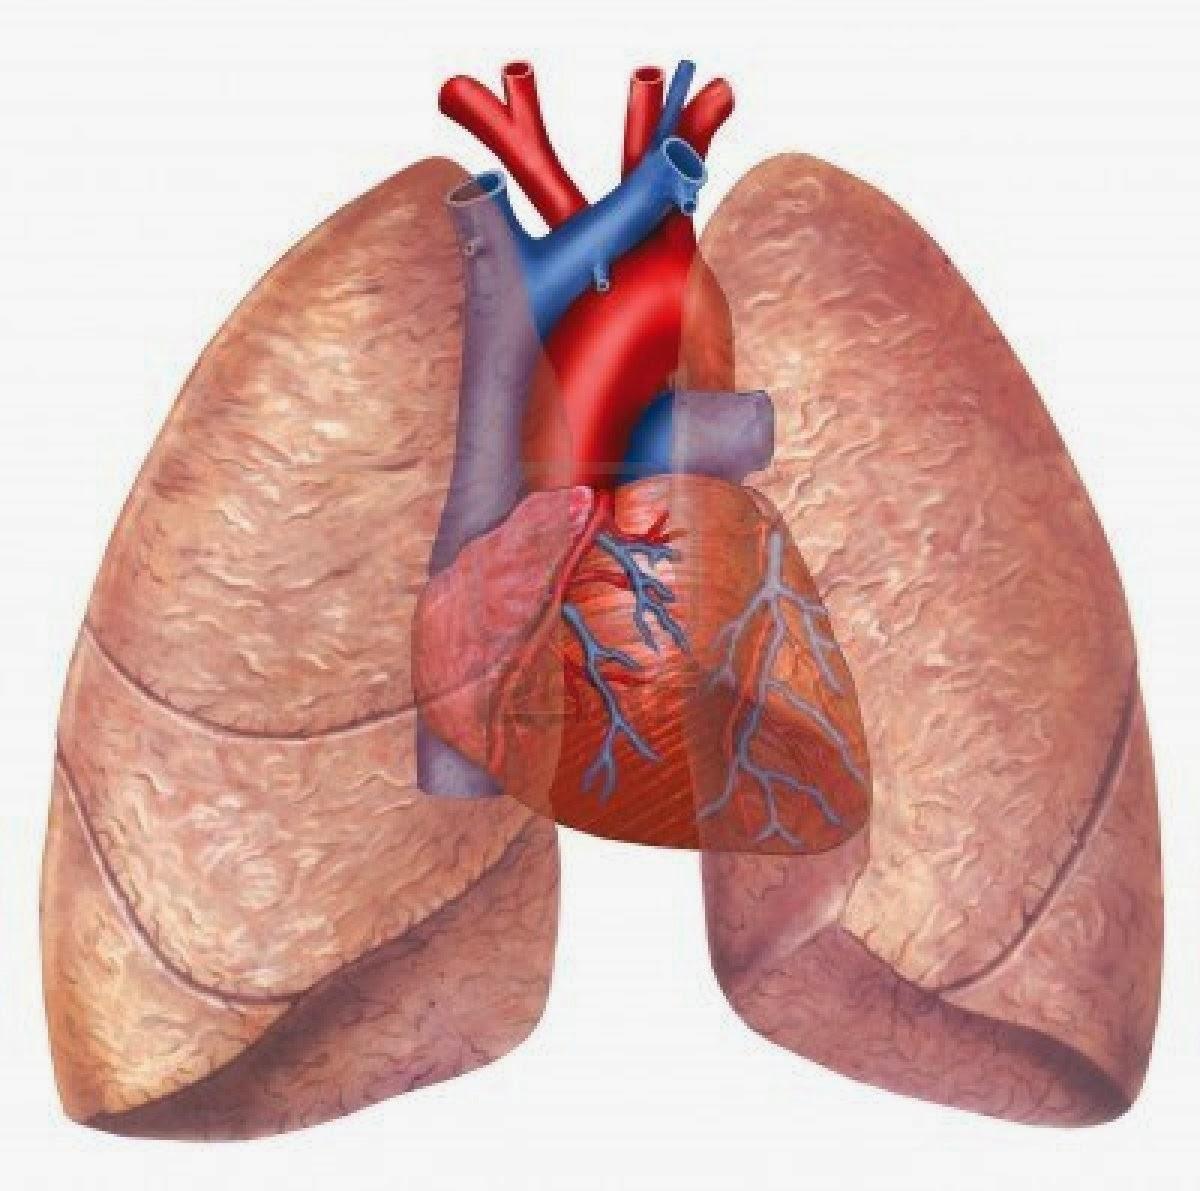 Anatomía Radiológica TORAX: PULMONES